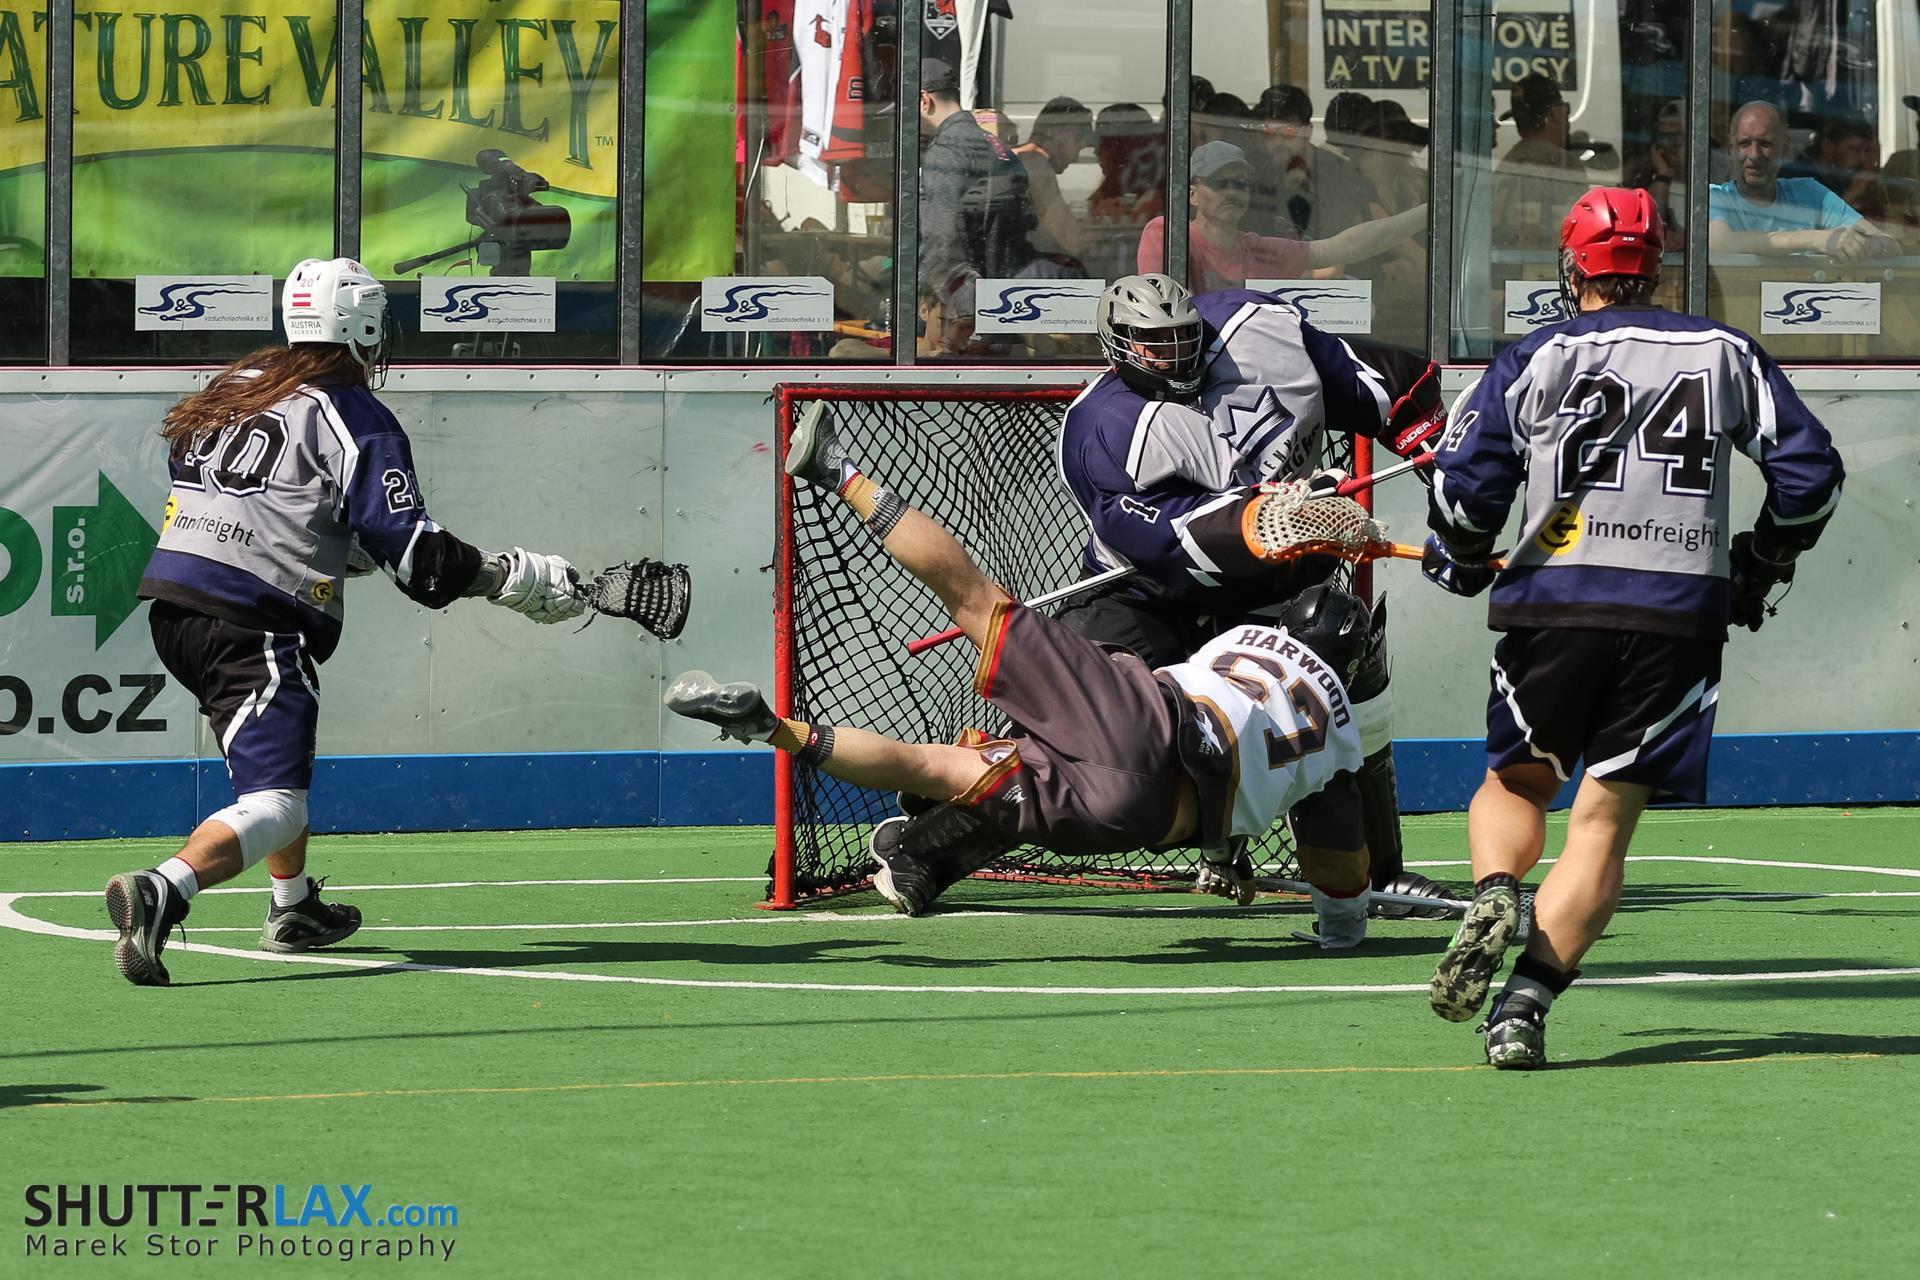 Patrick Falb Vienna Monarchs Austria Lacrosse goalie photo: Marek Stor Shutterlax.com